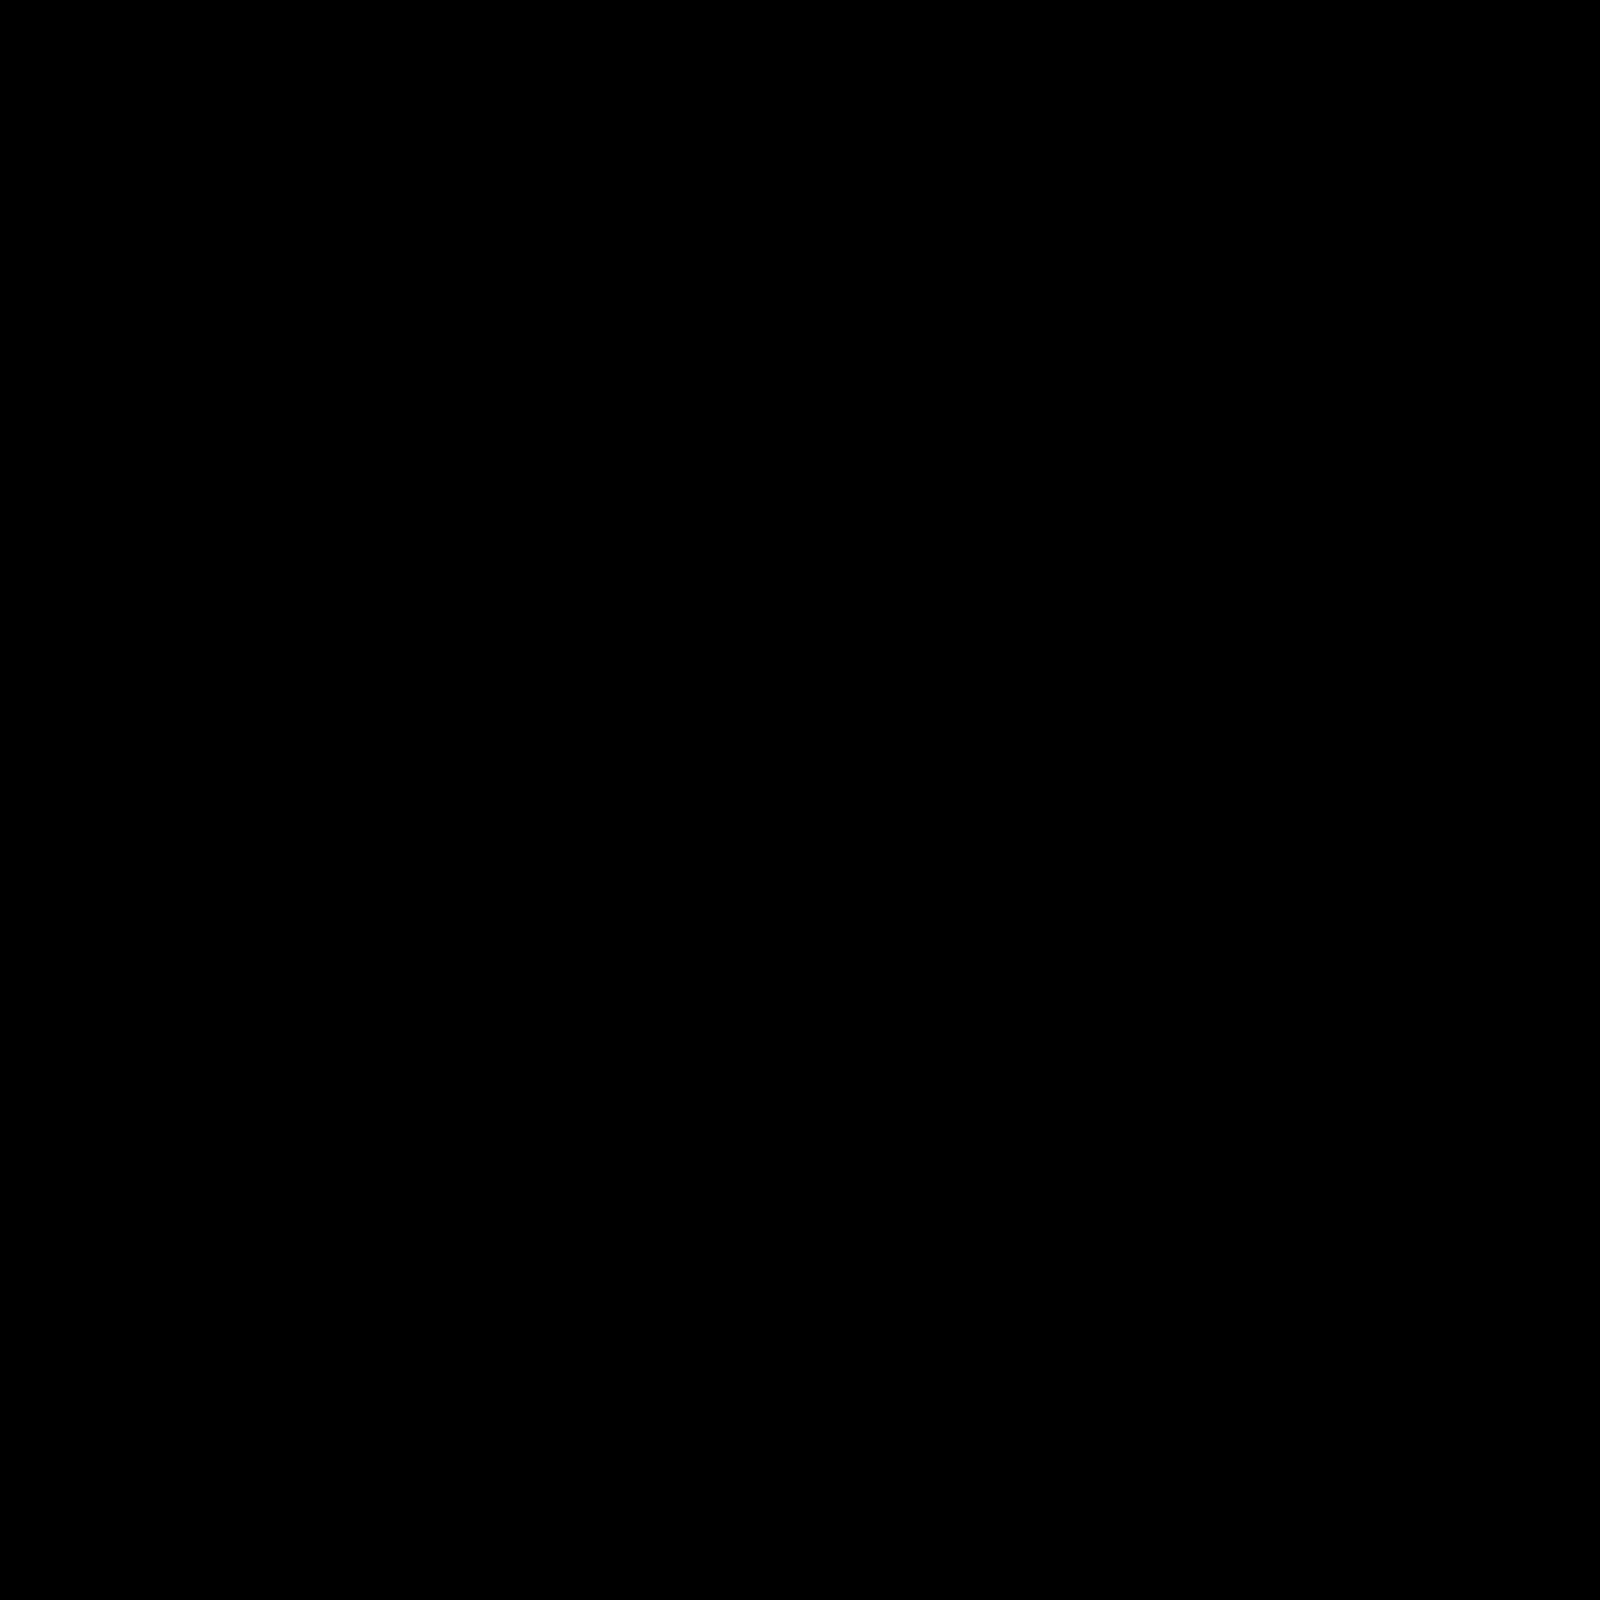 Bocce icon